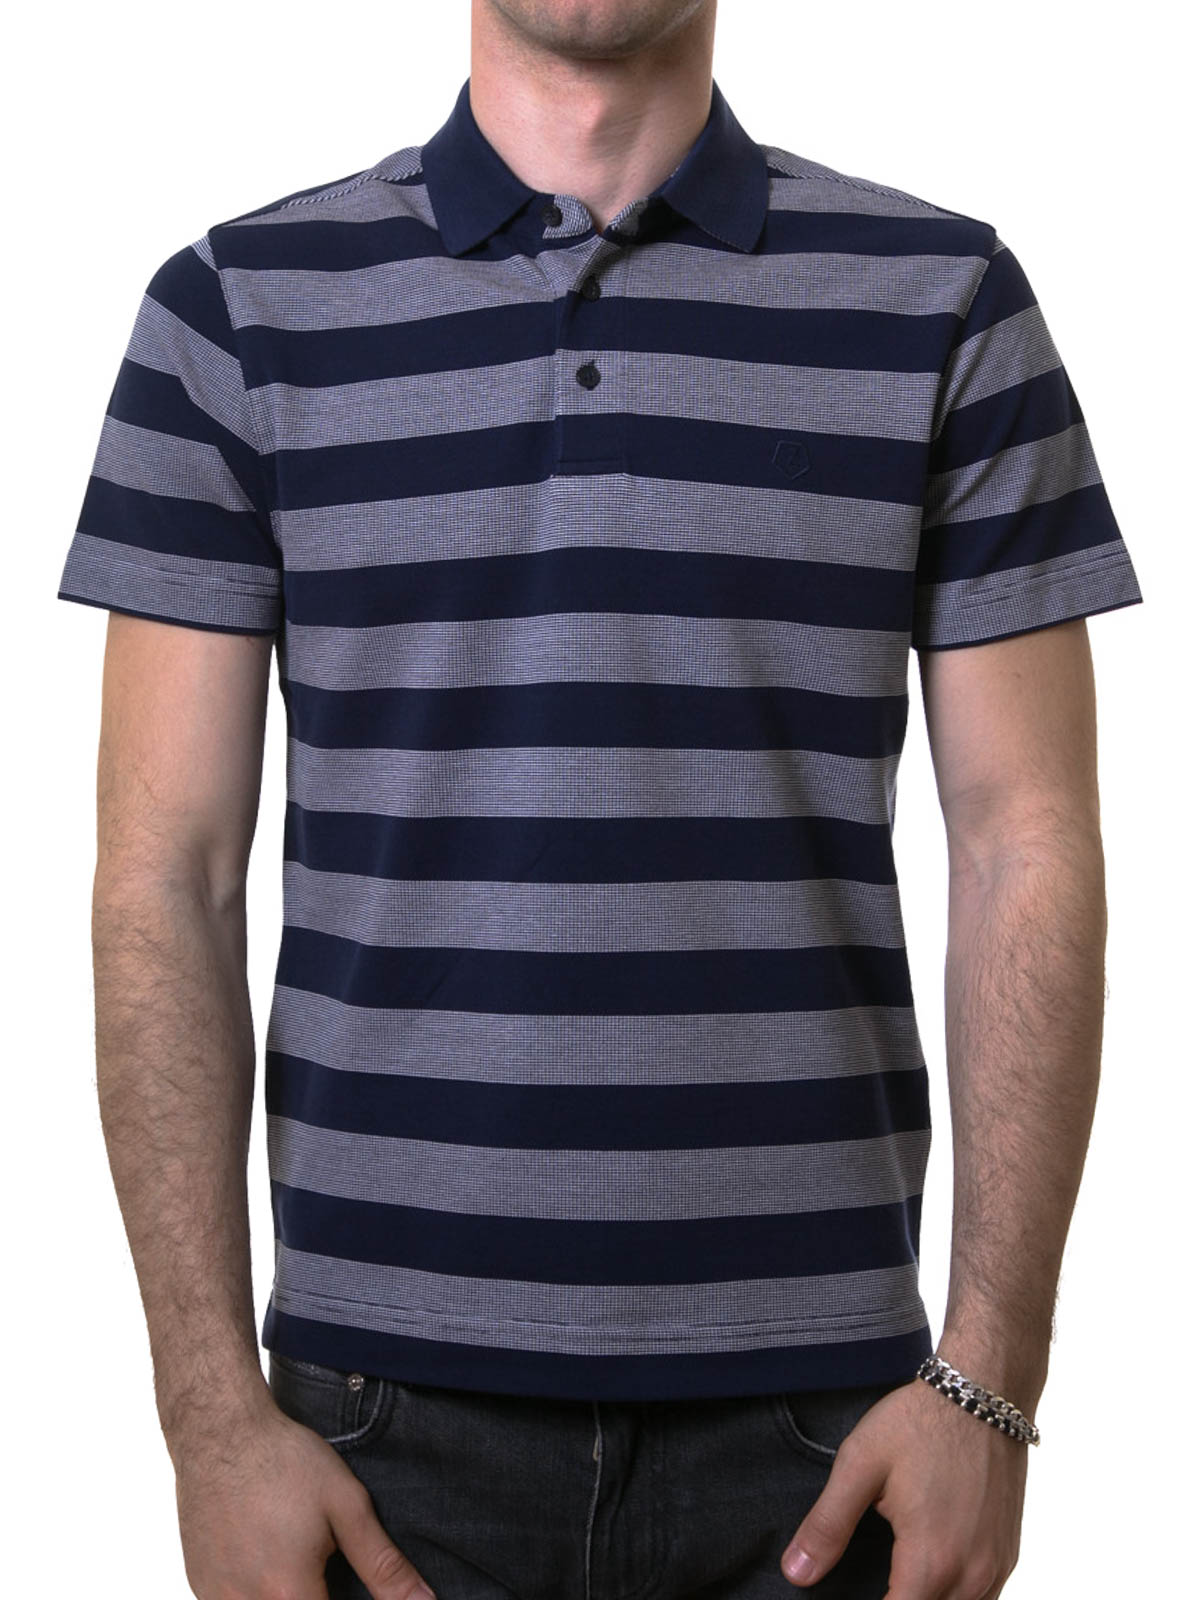 Striped cotton polo shirt by z zegna polo shirts ikrix for Zegna polo shirts sale